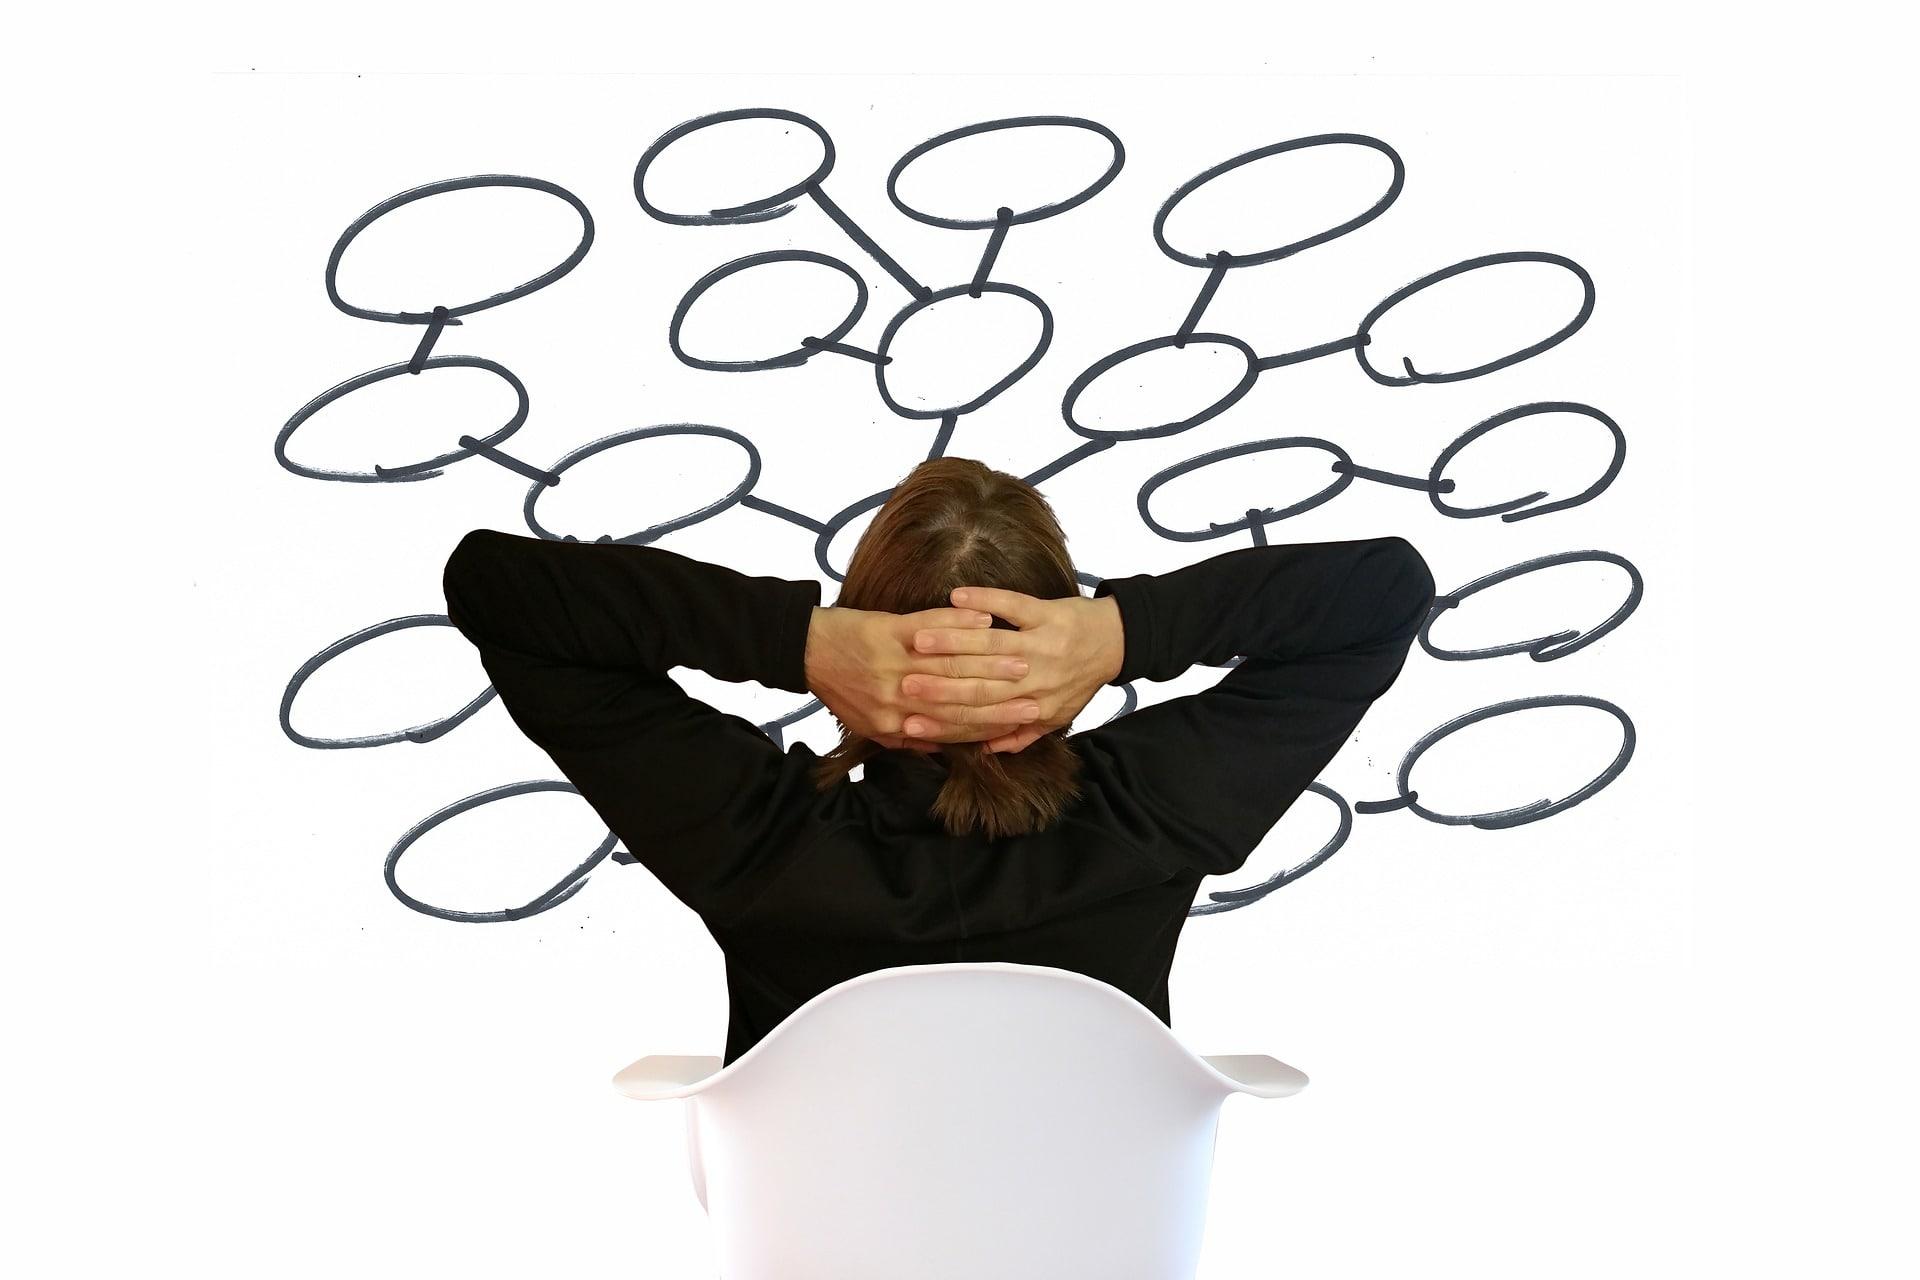 Anxiété, ruminations... Que faire ?